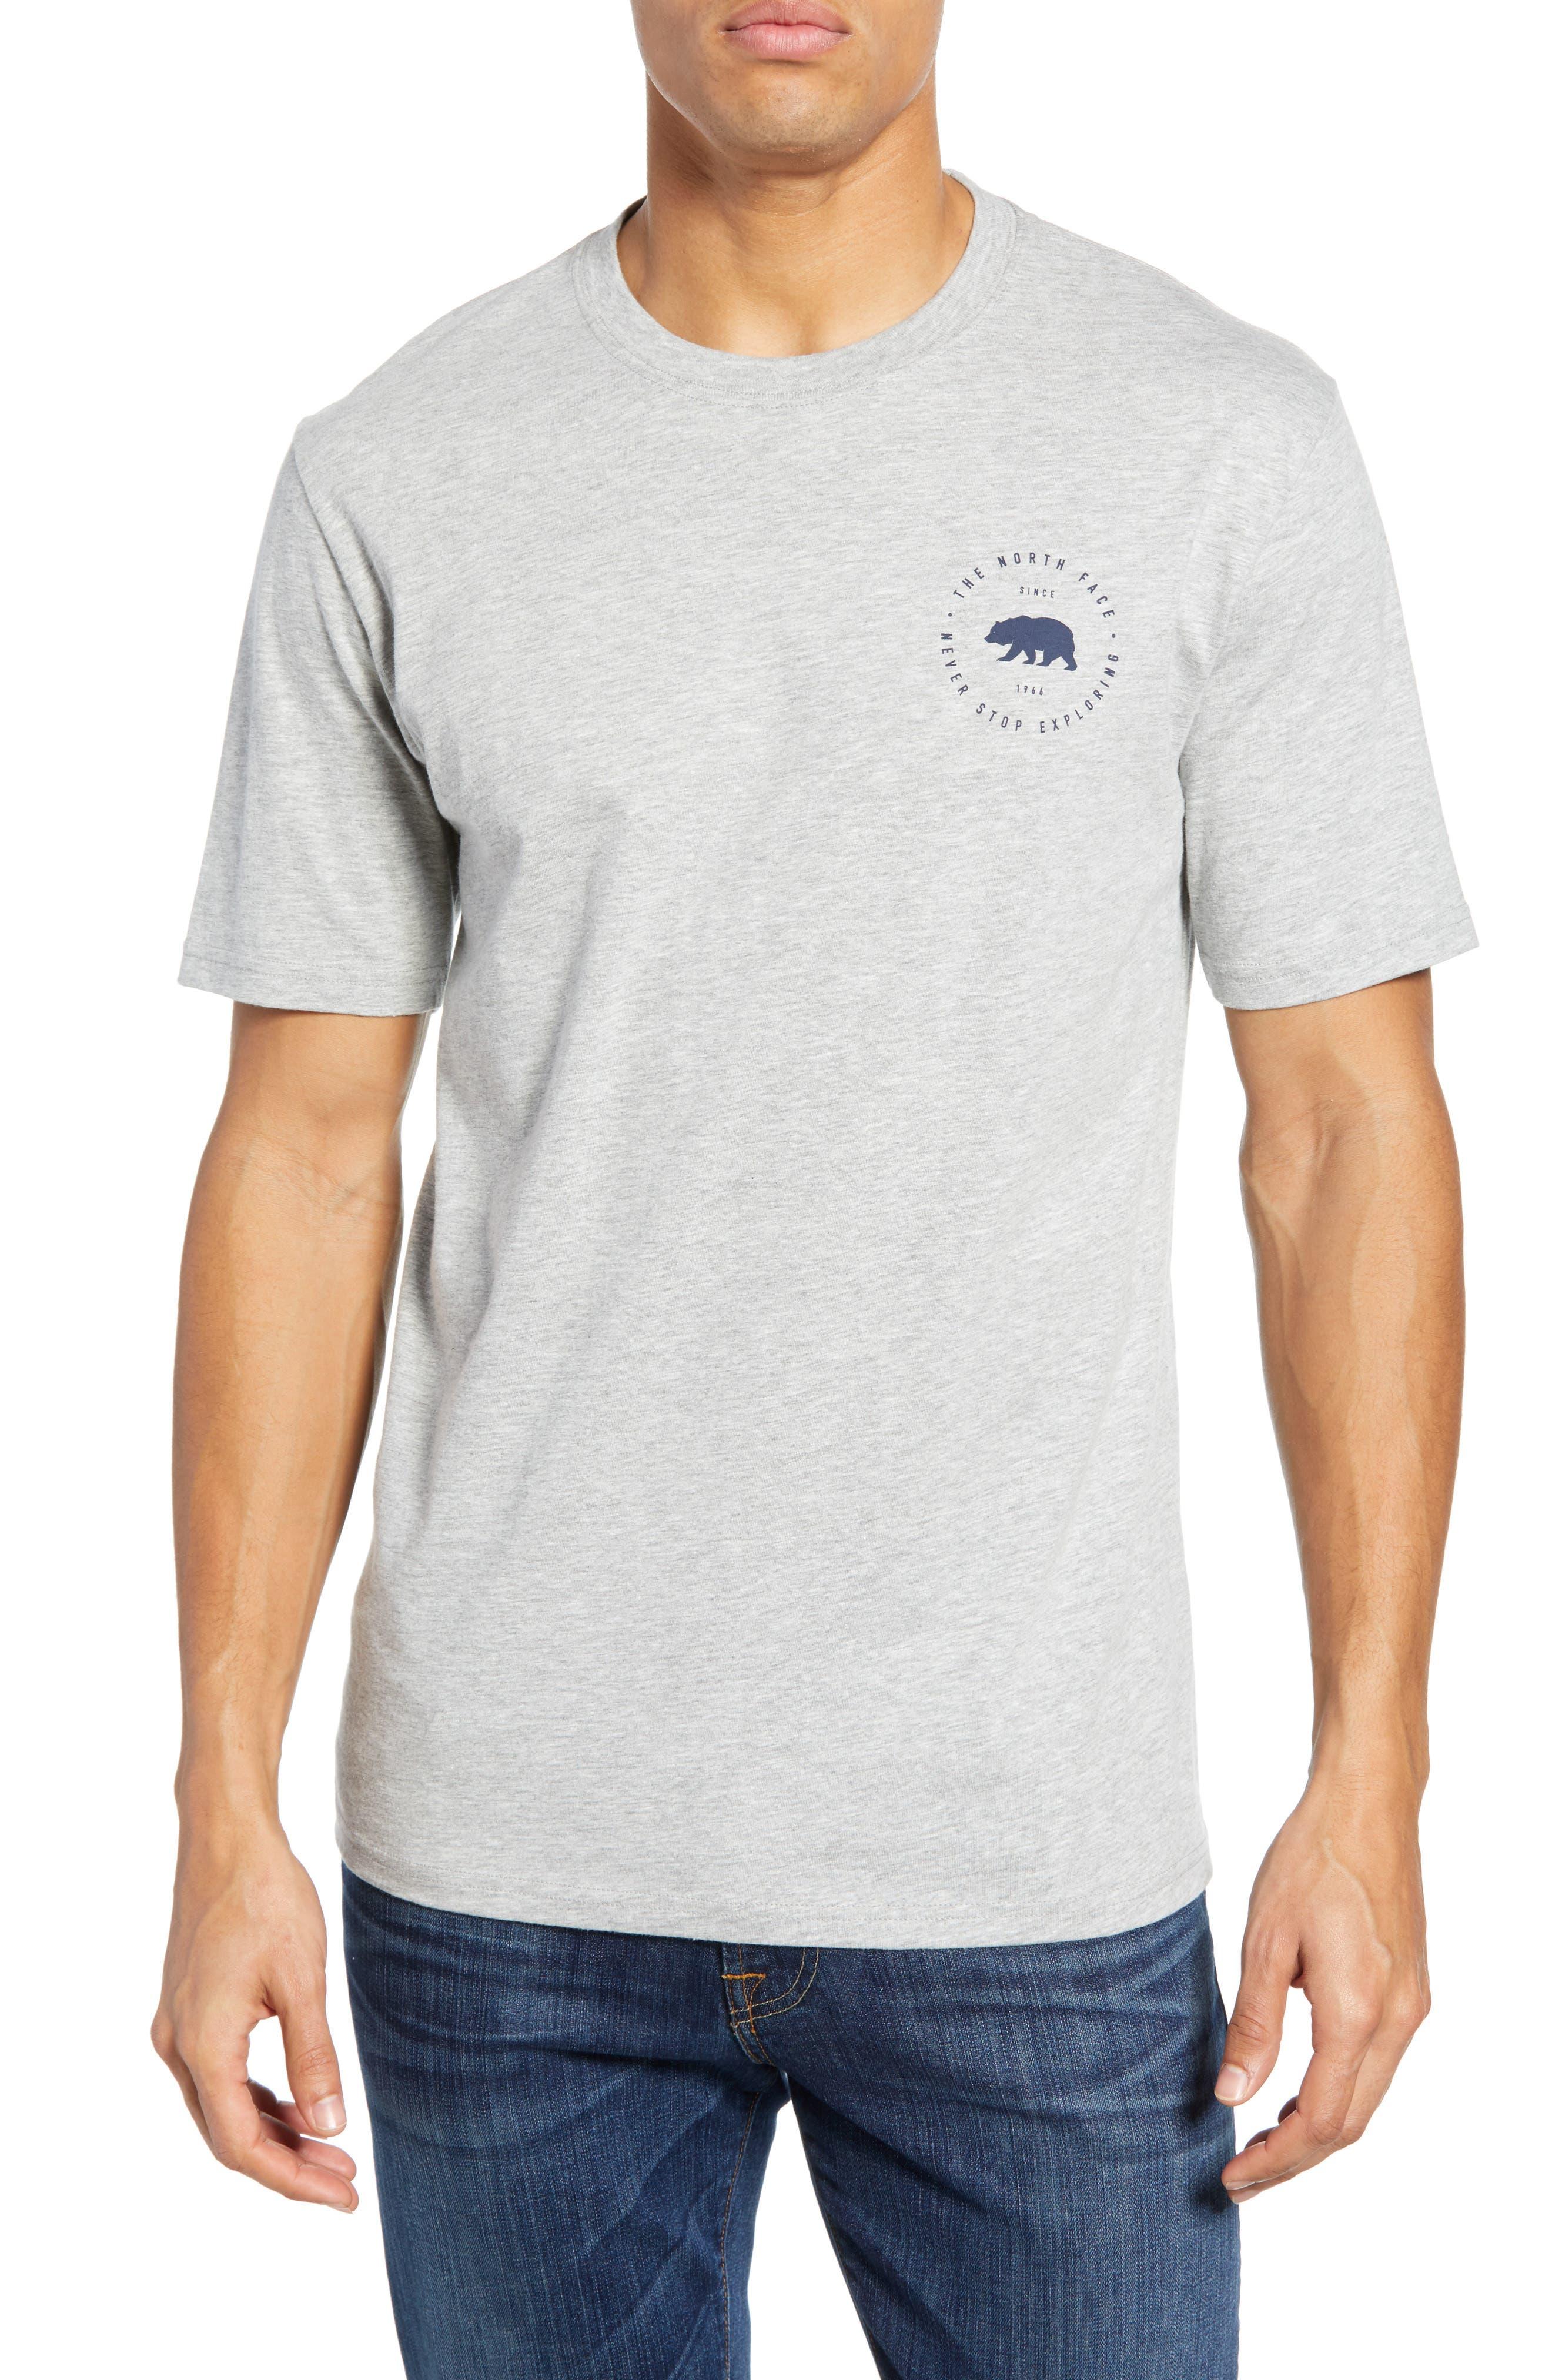 The North Face Bearitage Rights T-Shirt, Grey